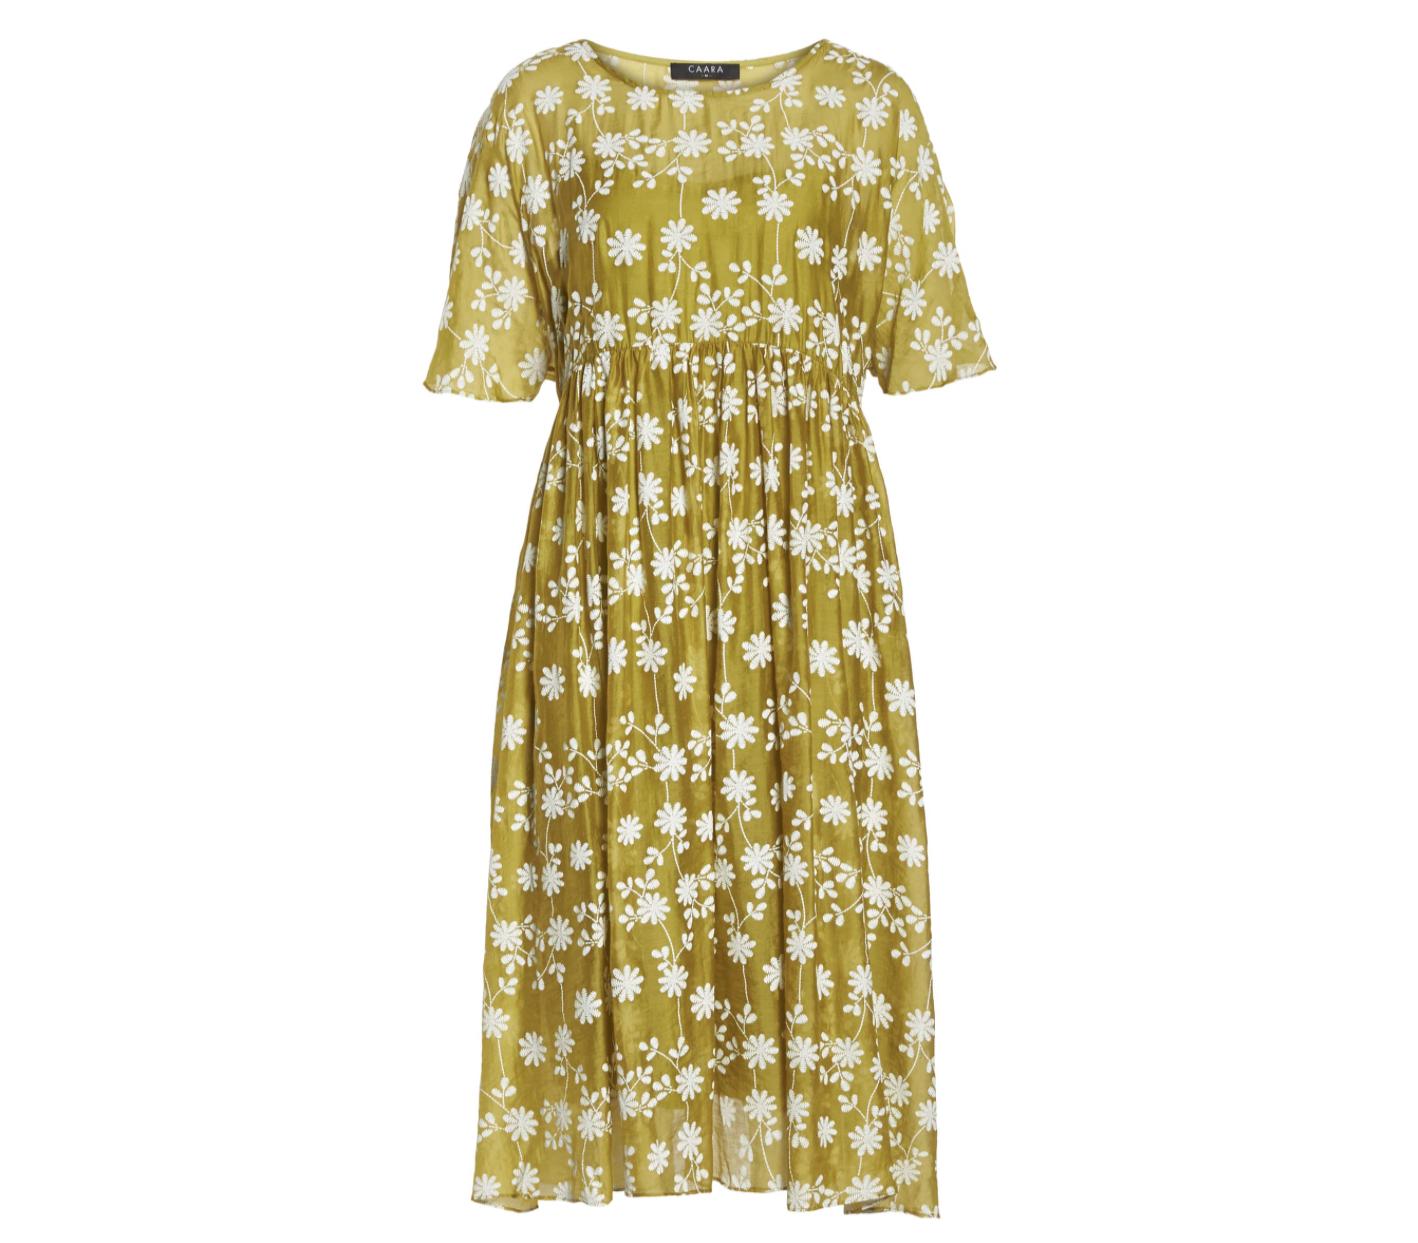 CAARA Daisy Picking Floral Dress